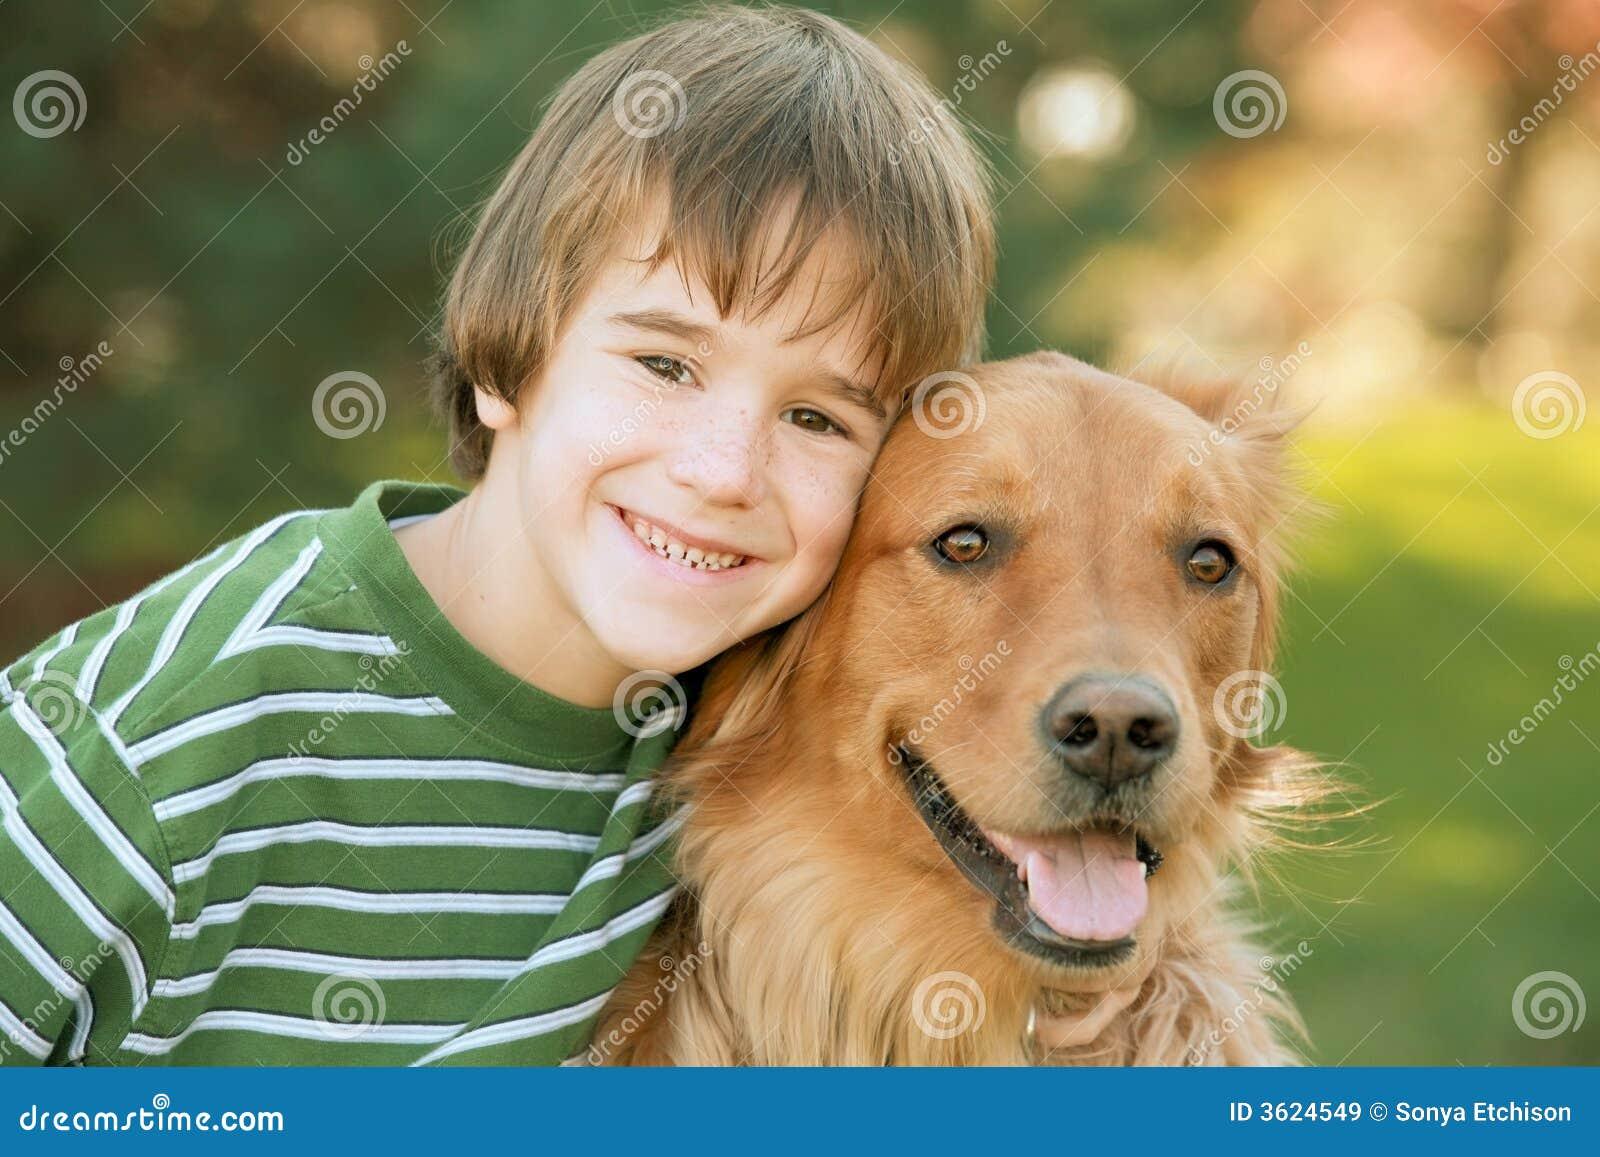 Boy with Golden Retriever